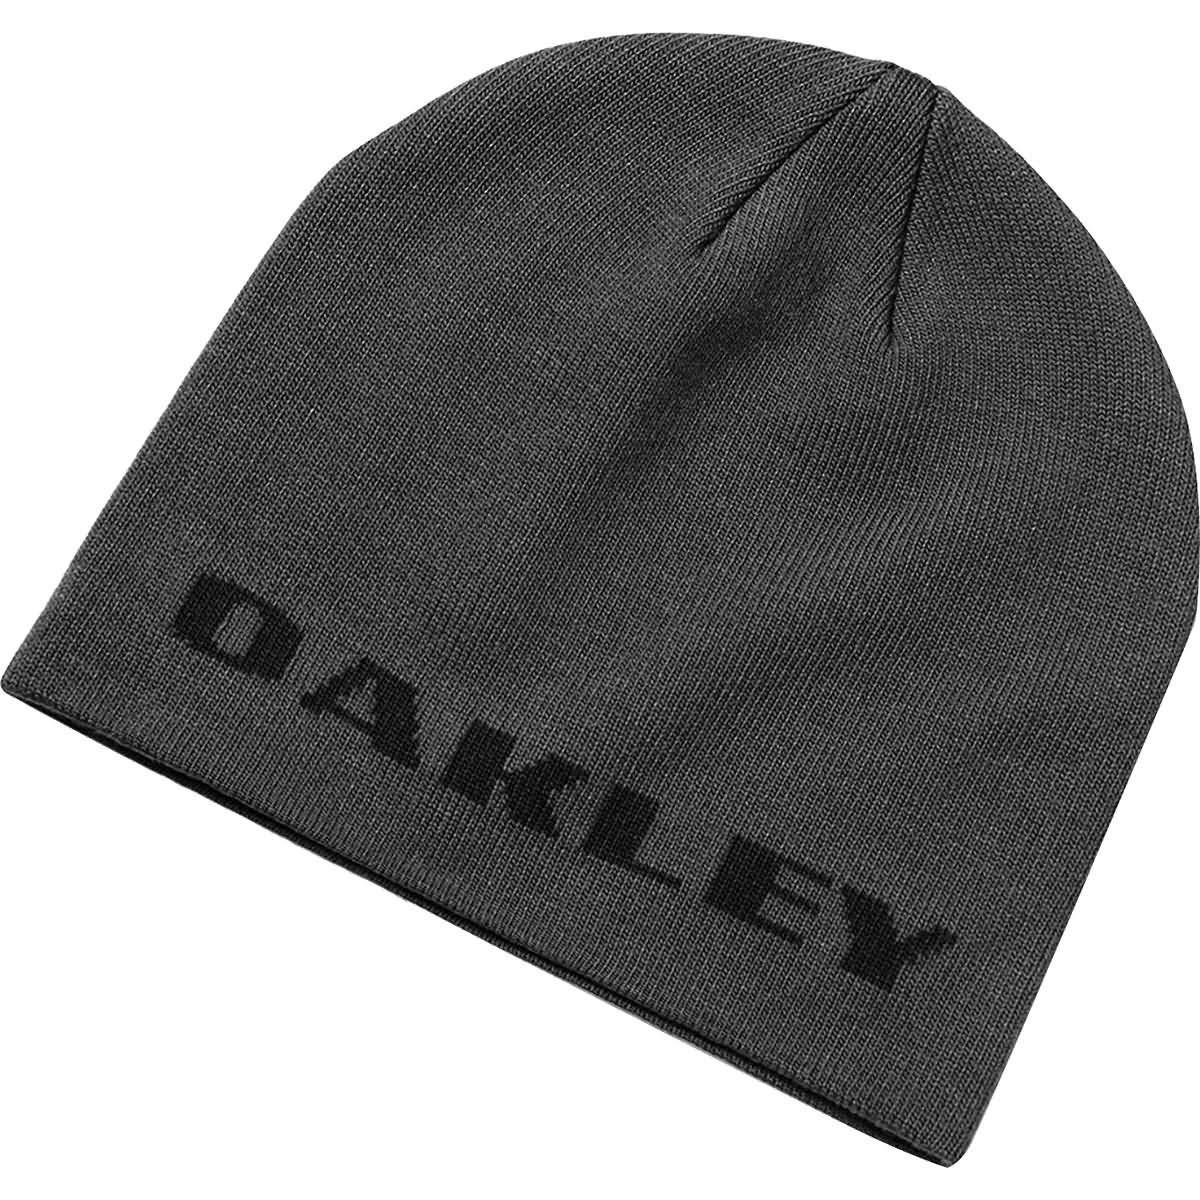 Oakley Men's Rockslide Beanie Hats,One Size,Forged Iron